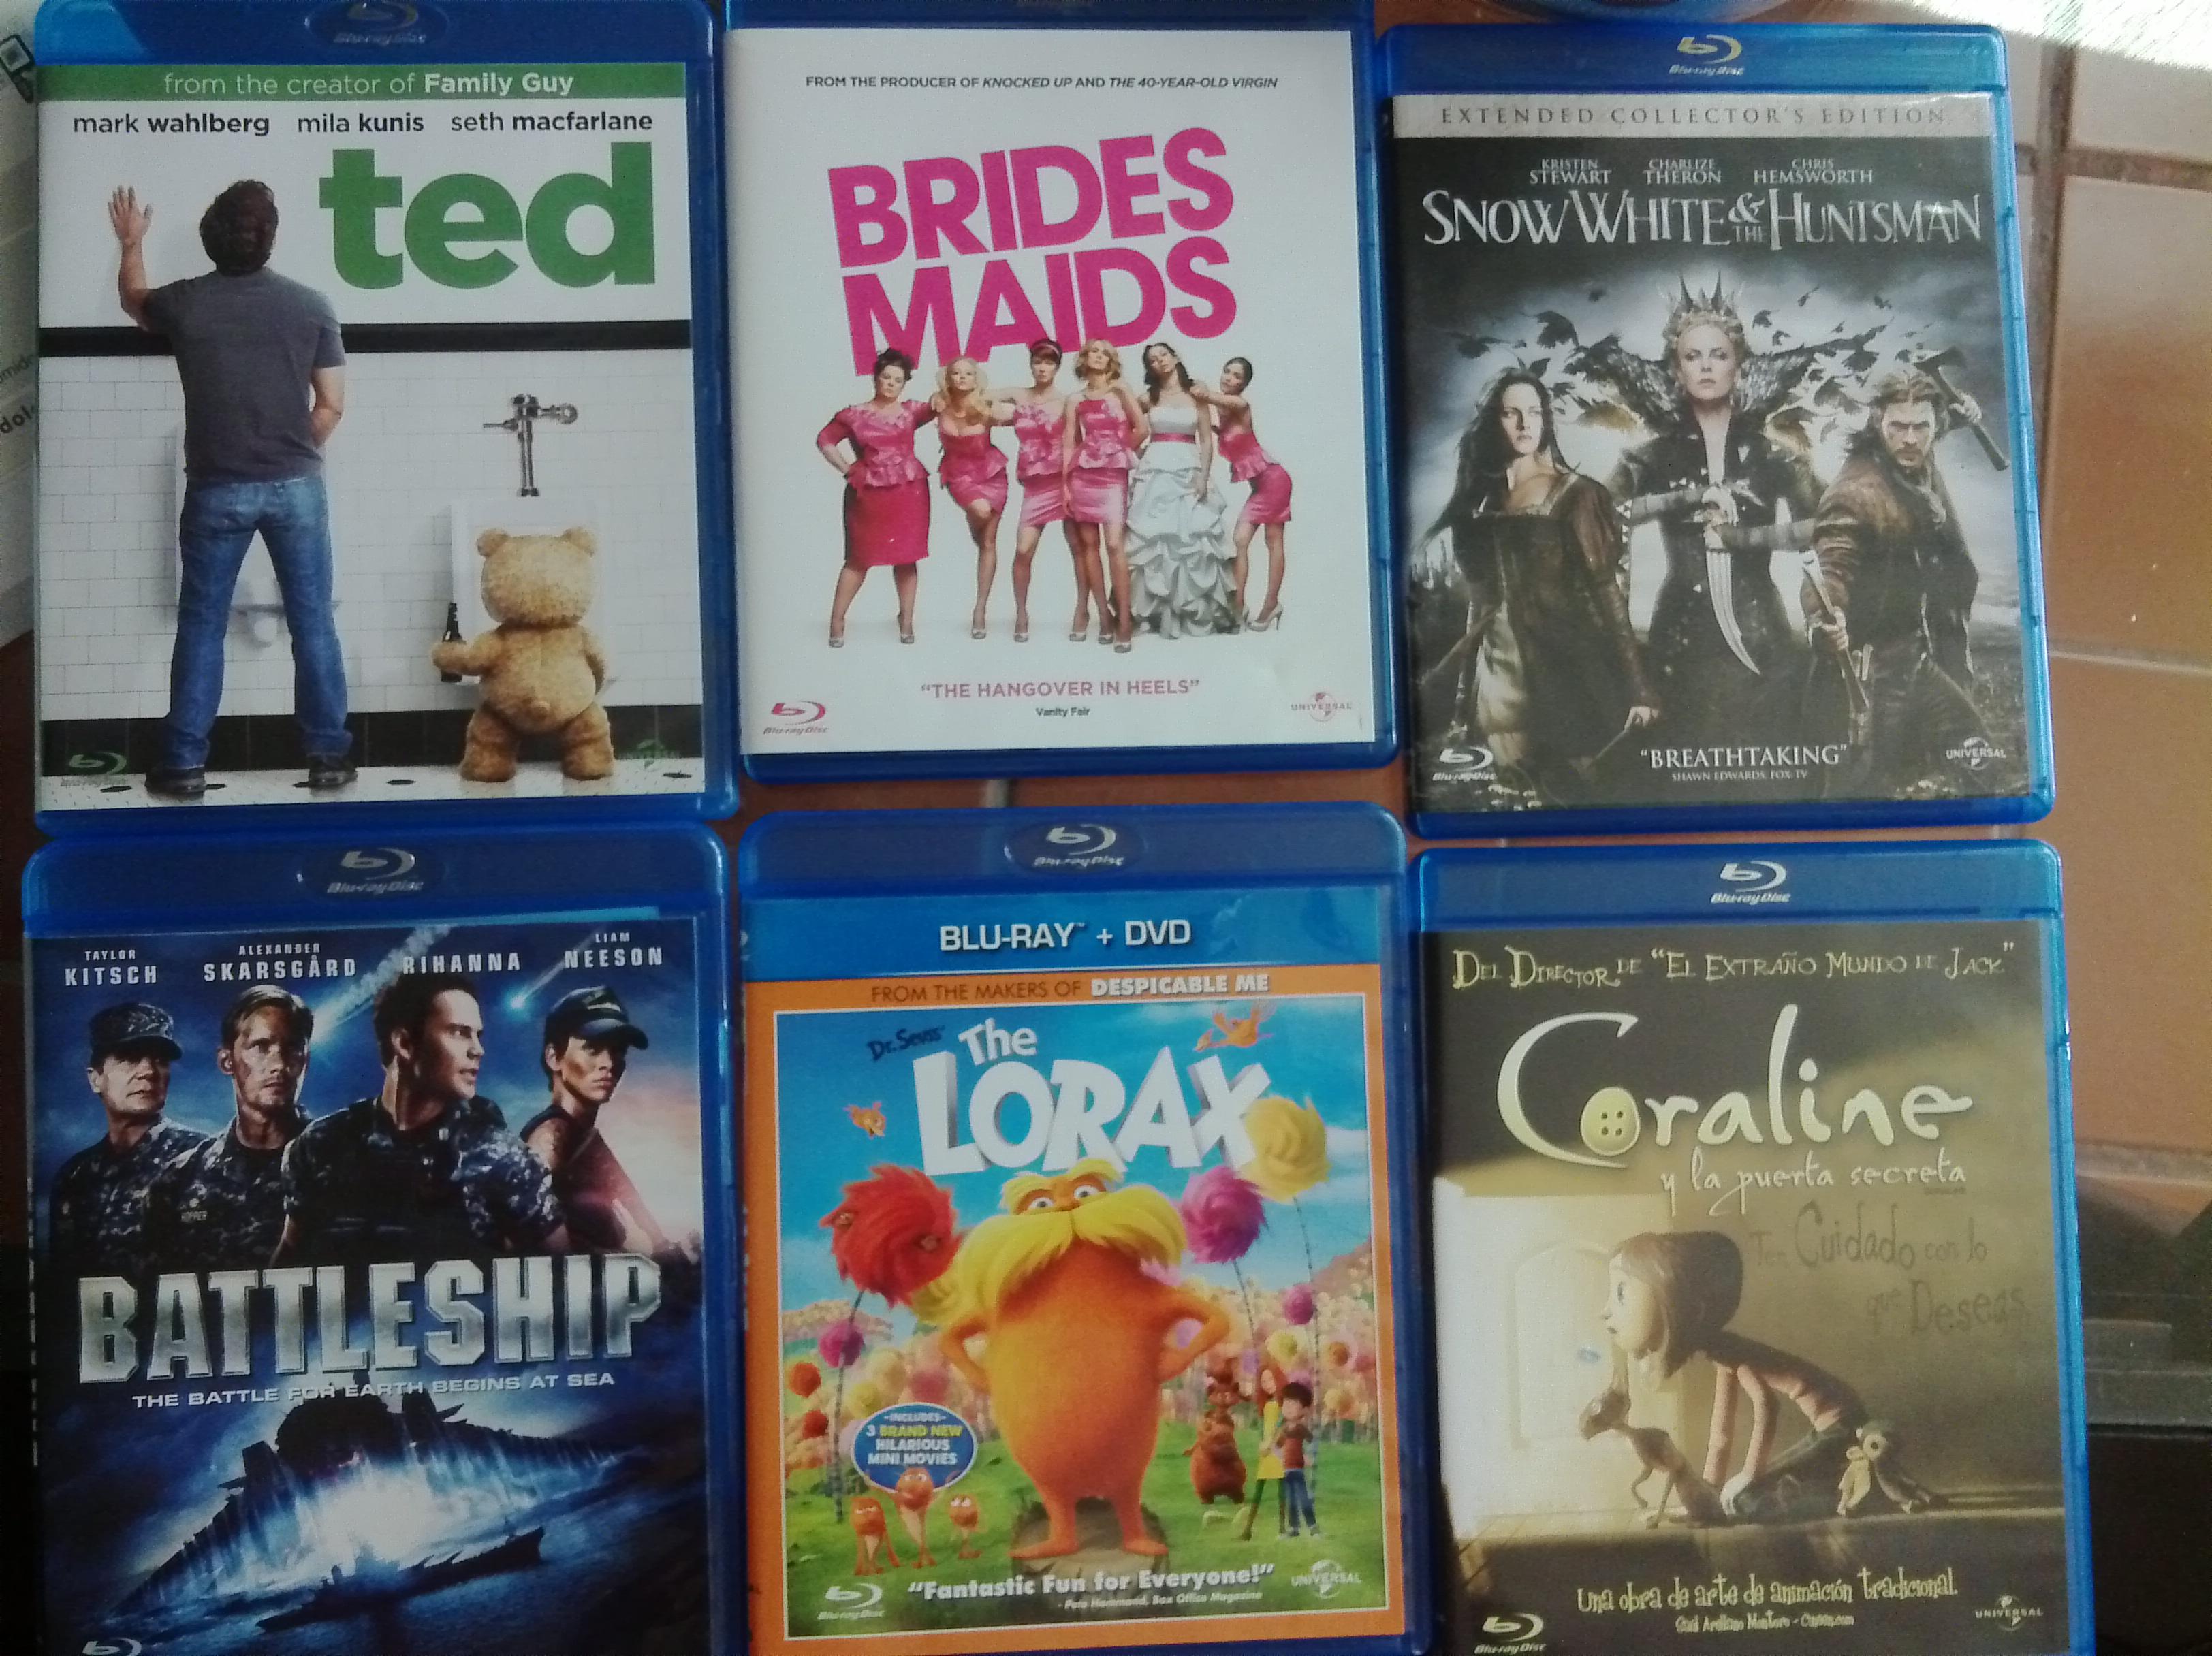 Walmart: Blu-Ray a solo $8.04